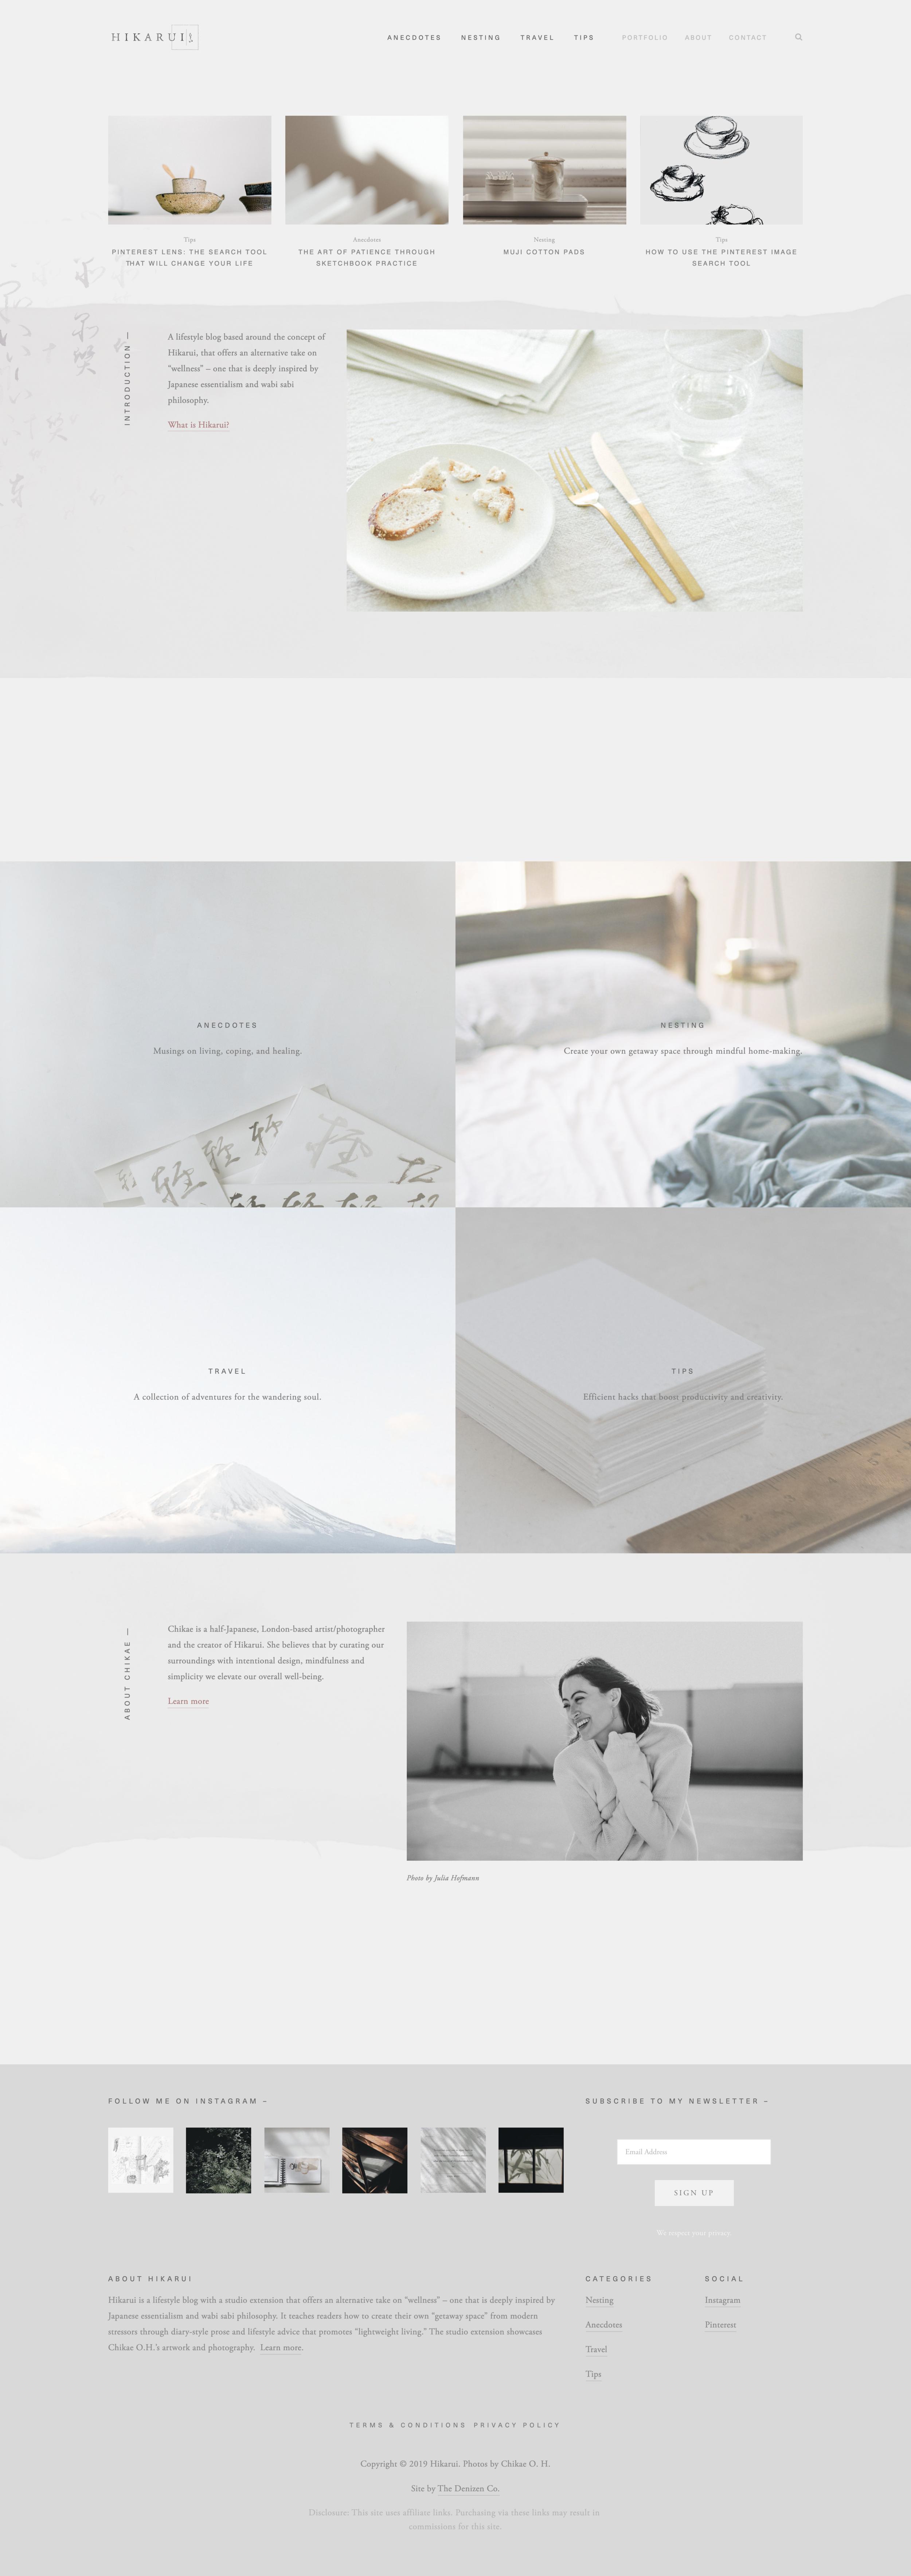 Branding And Web Design For Hikarui Minimal Web Design Web Design Web Layout Design